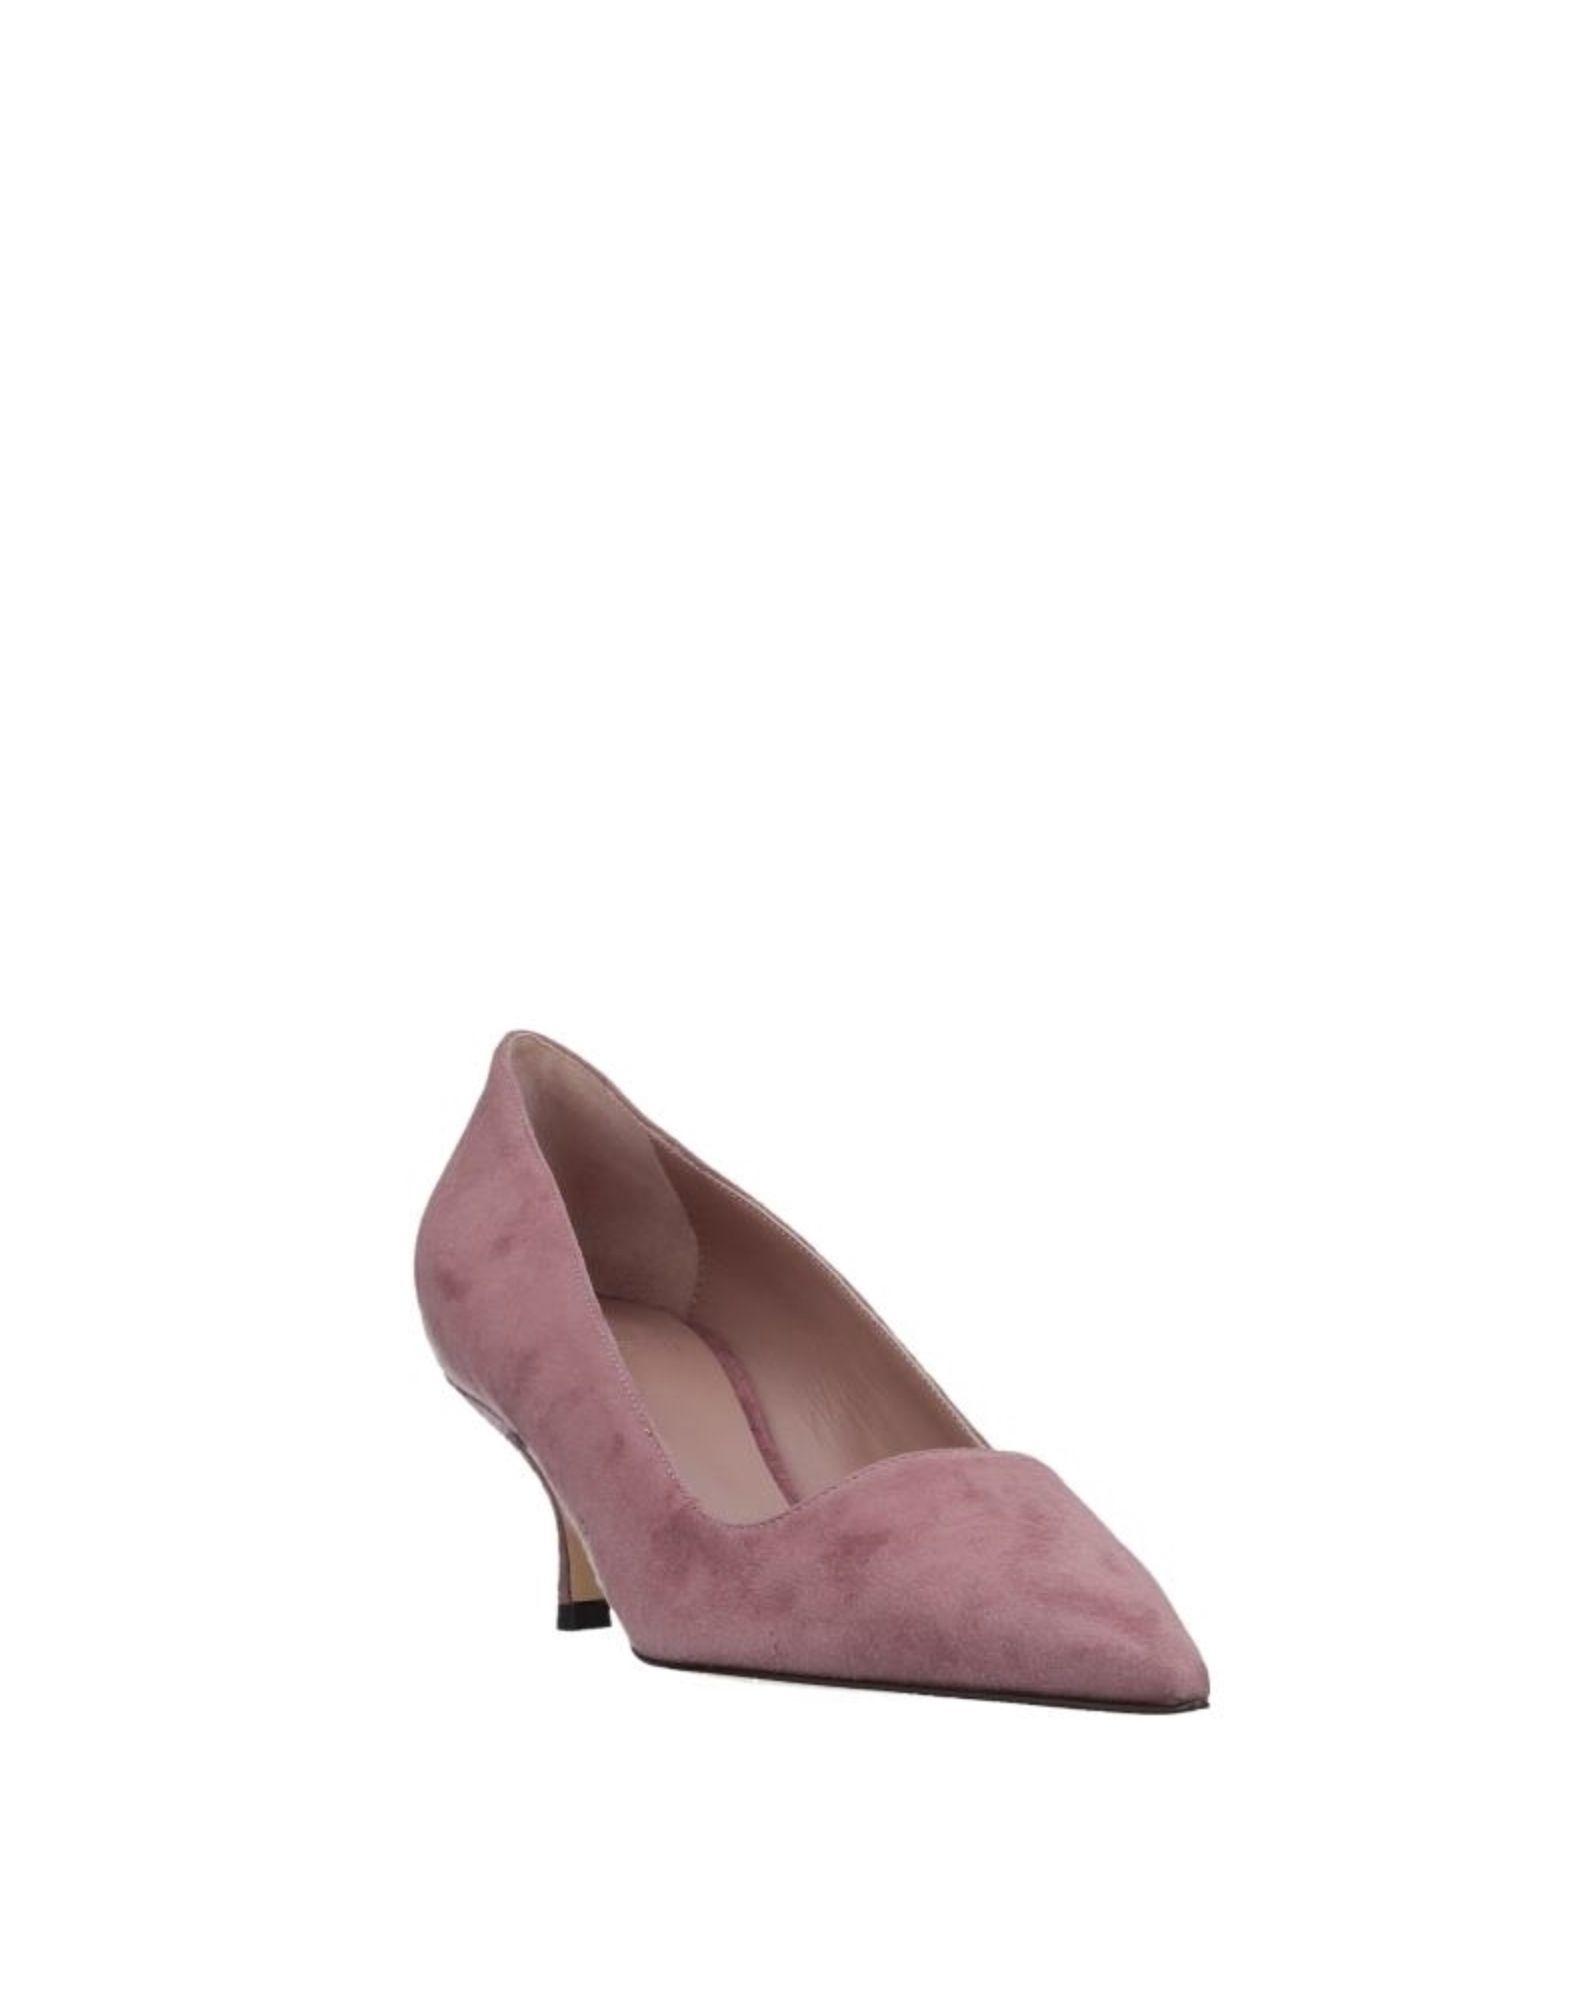 Stilvolle billige Schuhe Damen Gianna Meliani Pumps Damen Schuhe  11507233NJ b9d57e